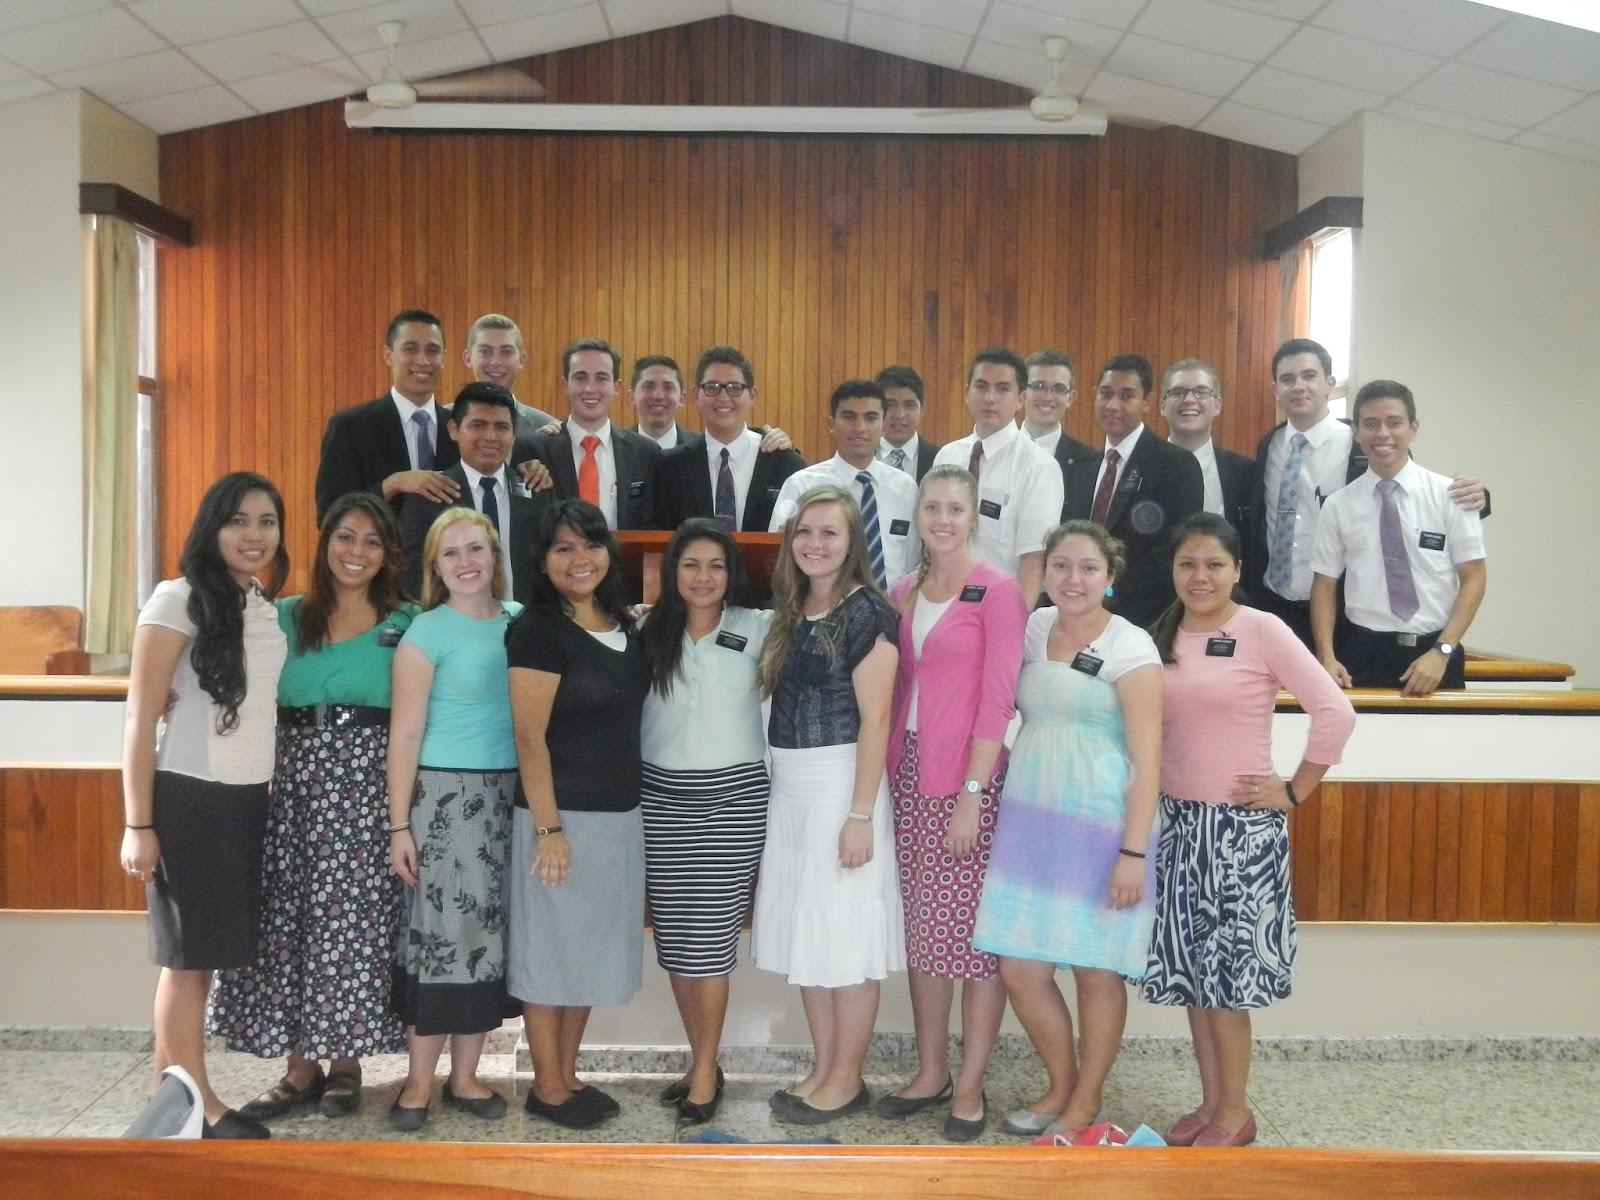 meet the mormons costa rica